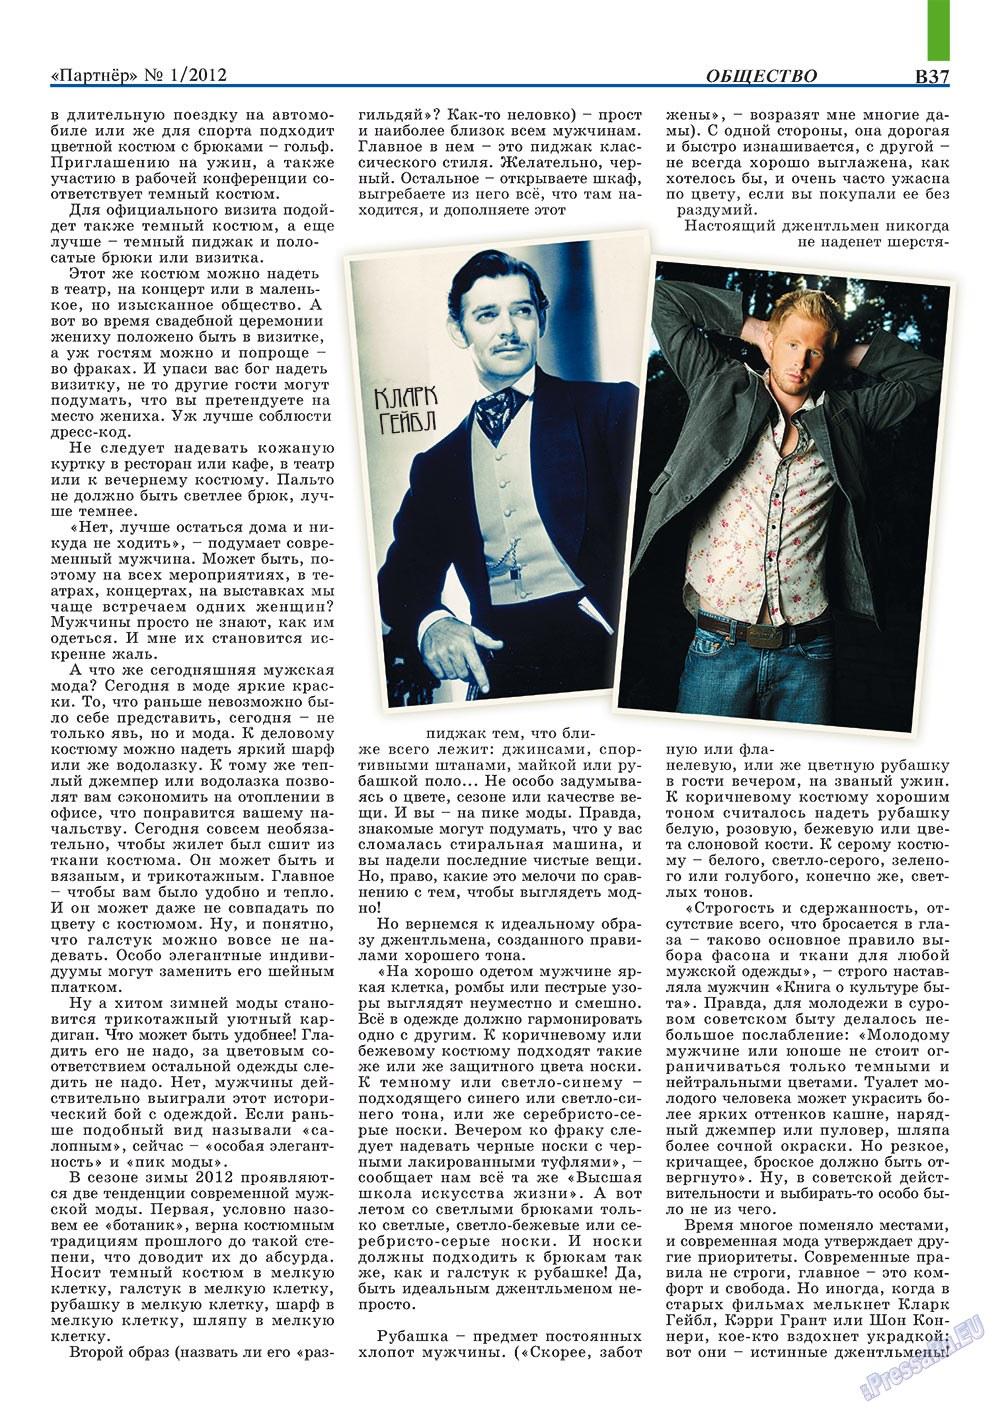 Партнер-север (журнал). 2012 год, номер 1, стр. 47